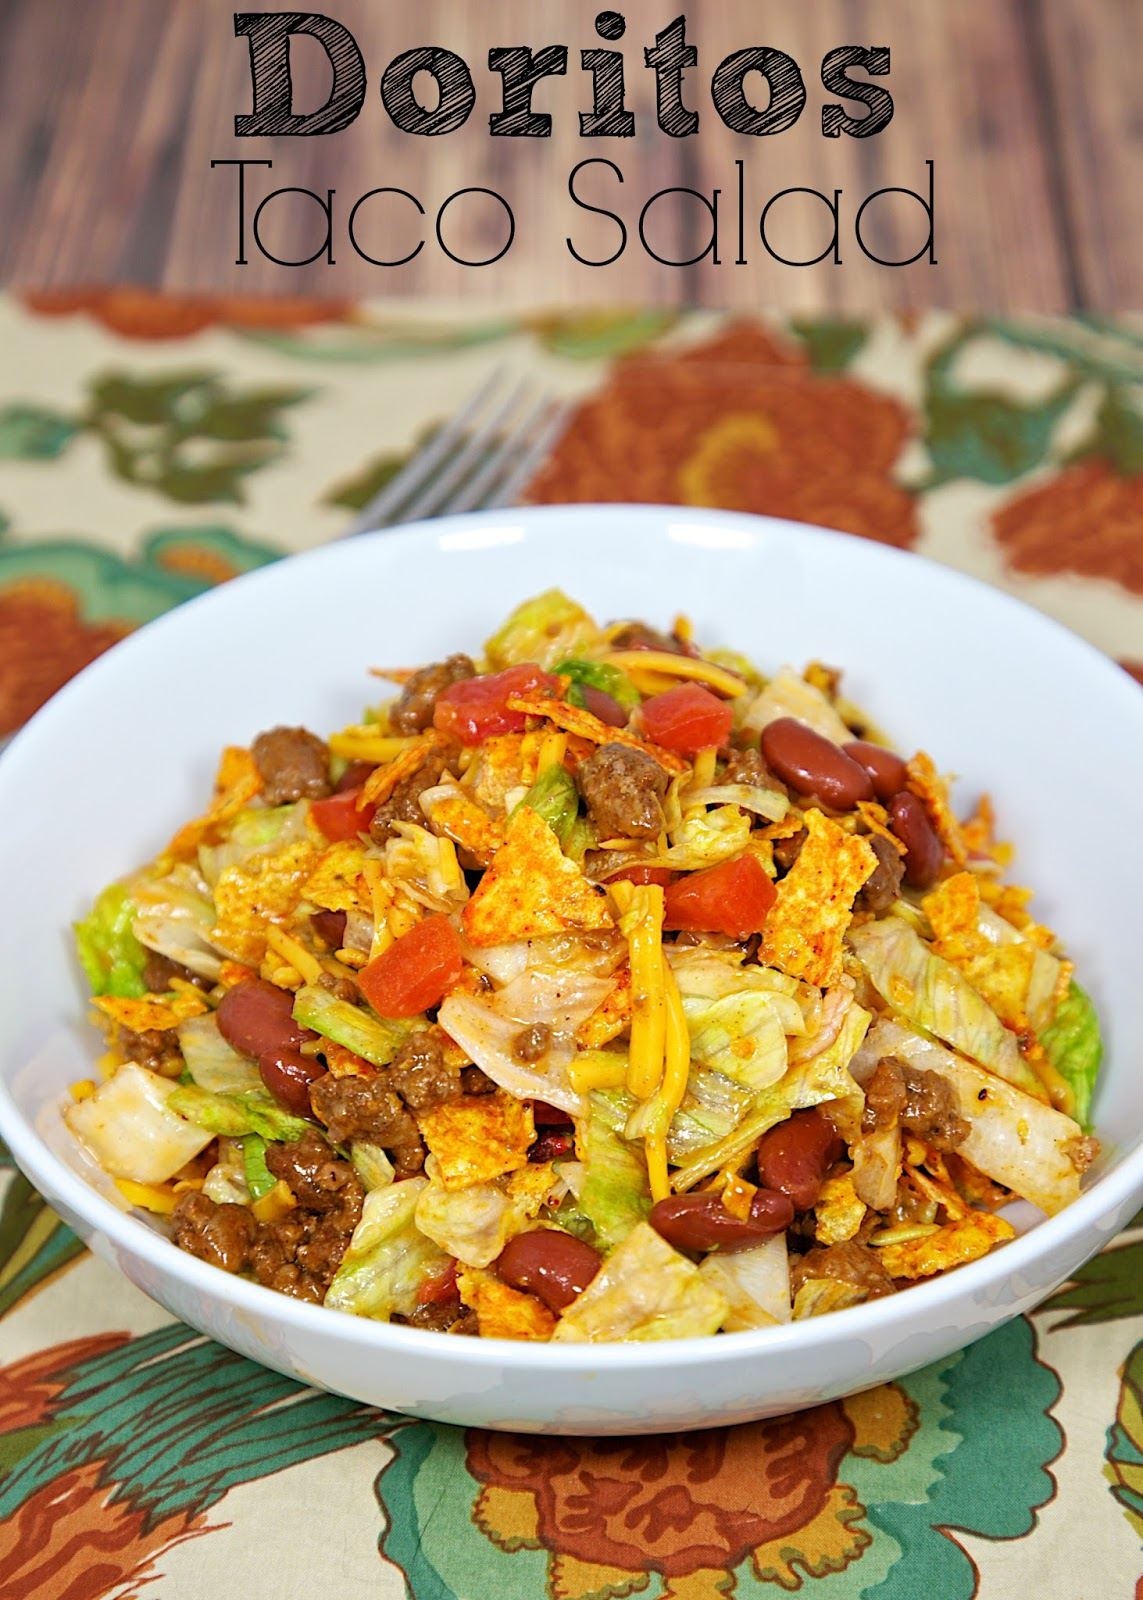 Doritos Taco Salad - taco meat, kidney beans, tomatoes, lettuce ...